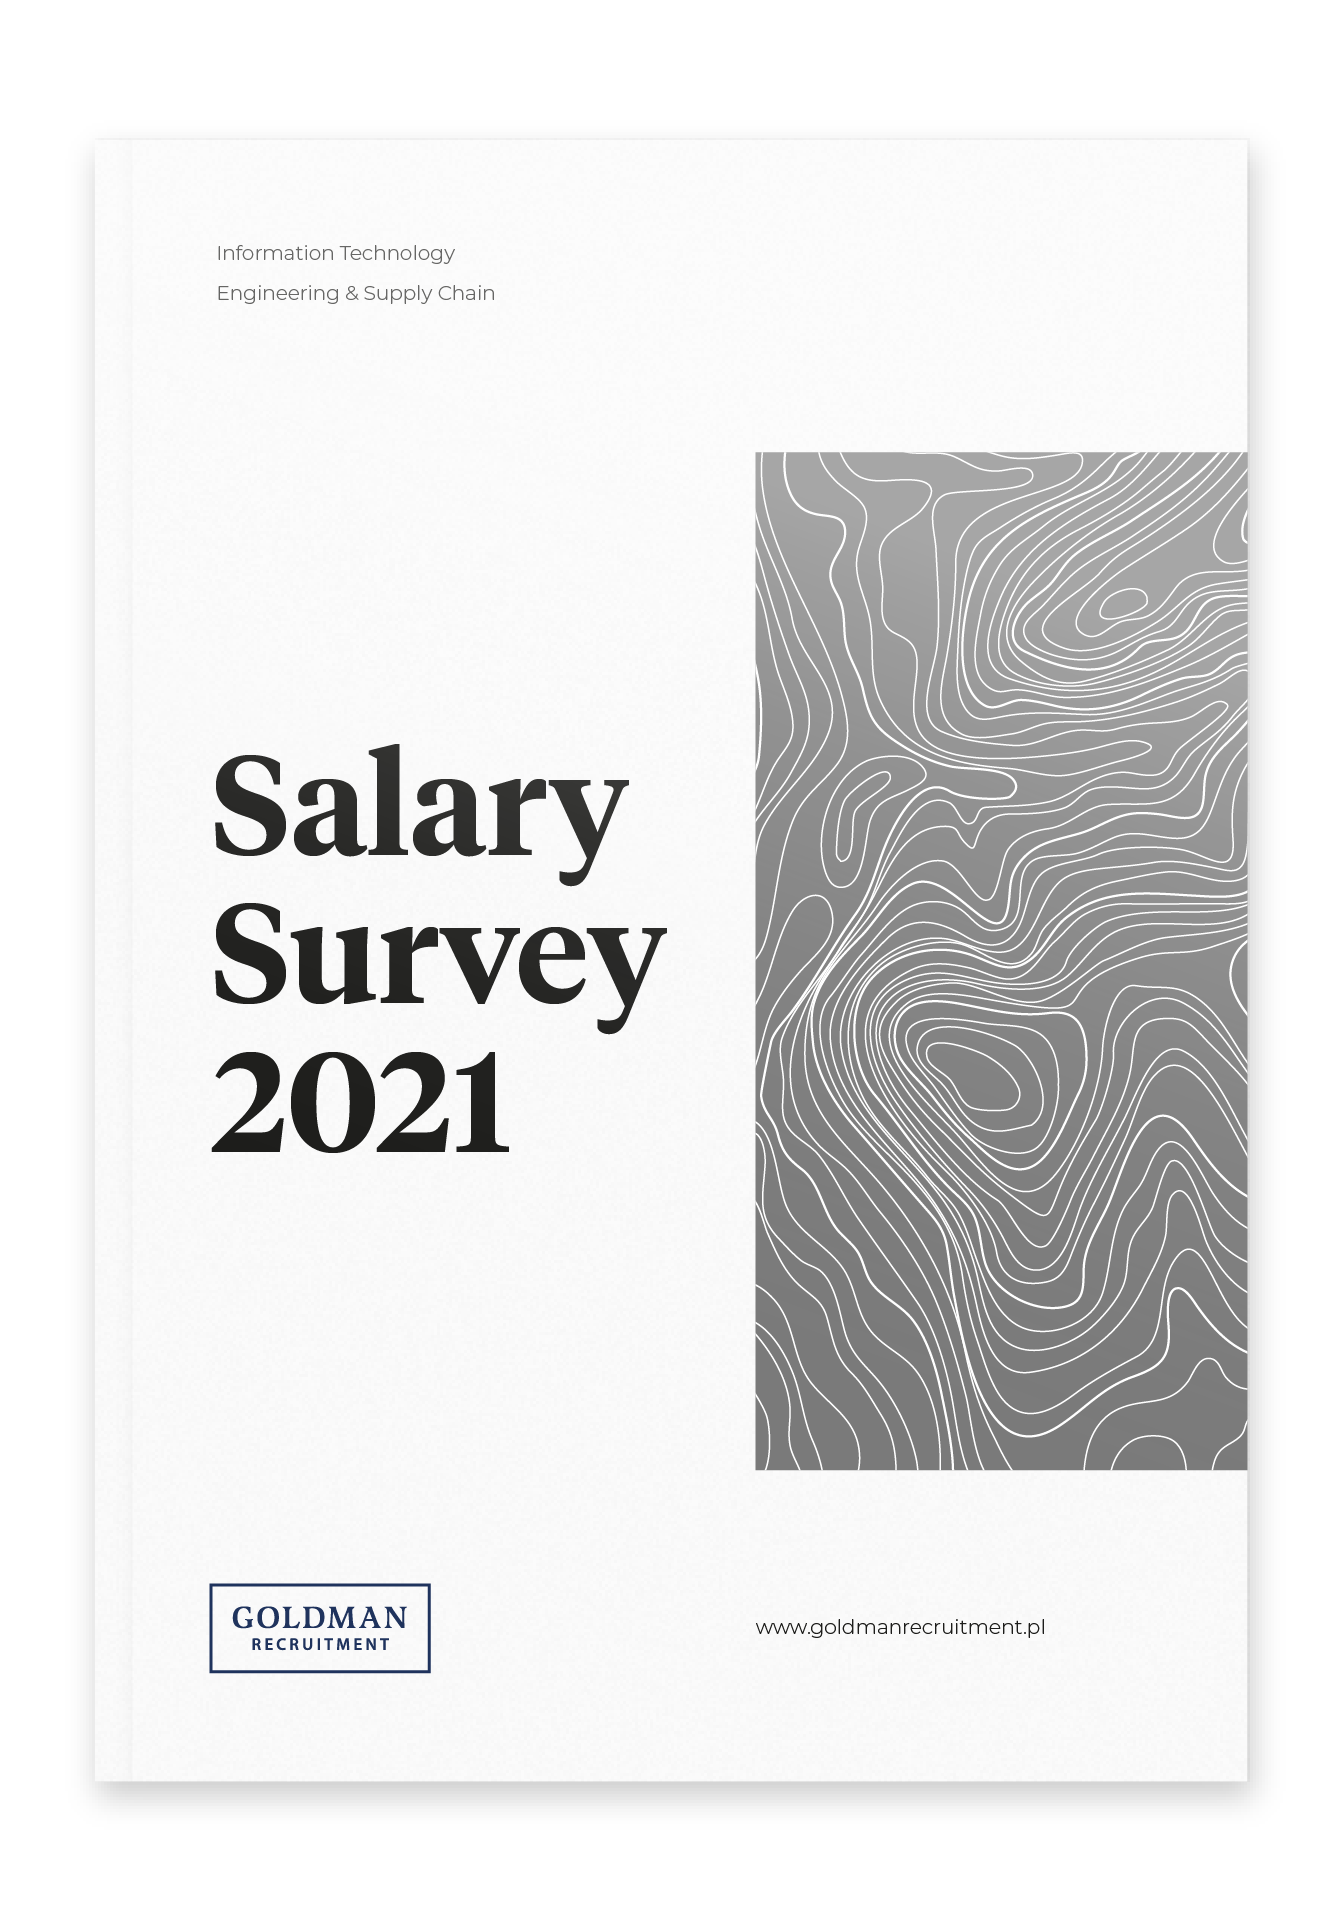 IT & Engineering Salary Survey 2021